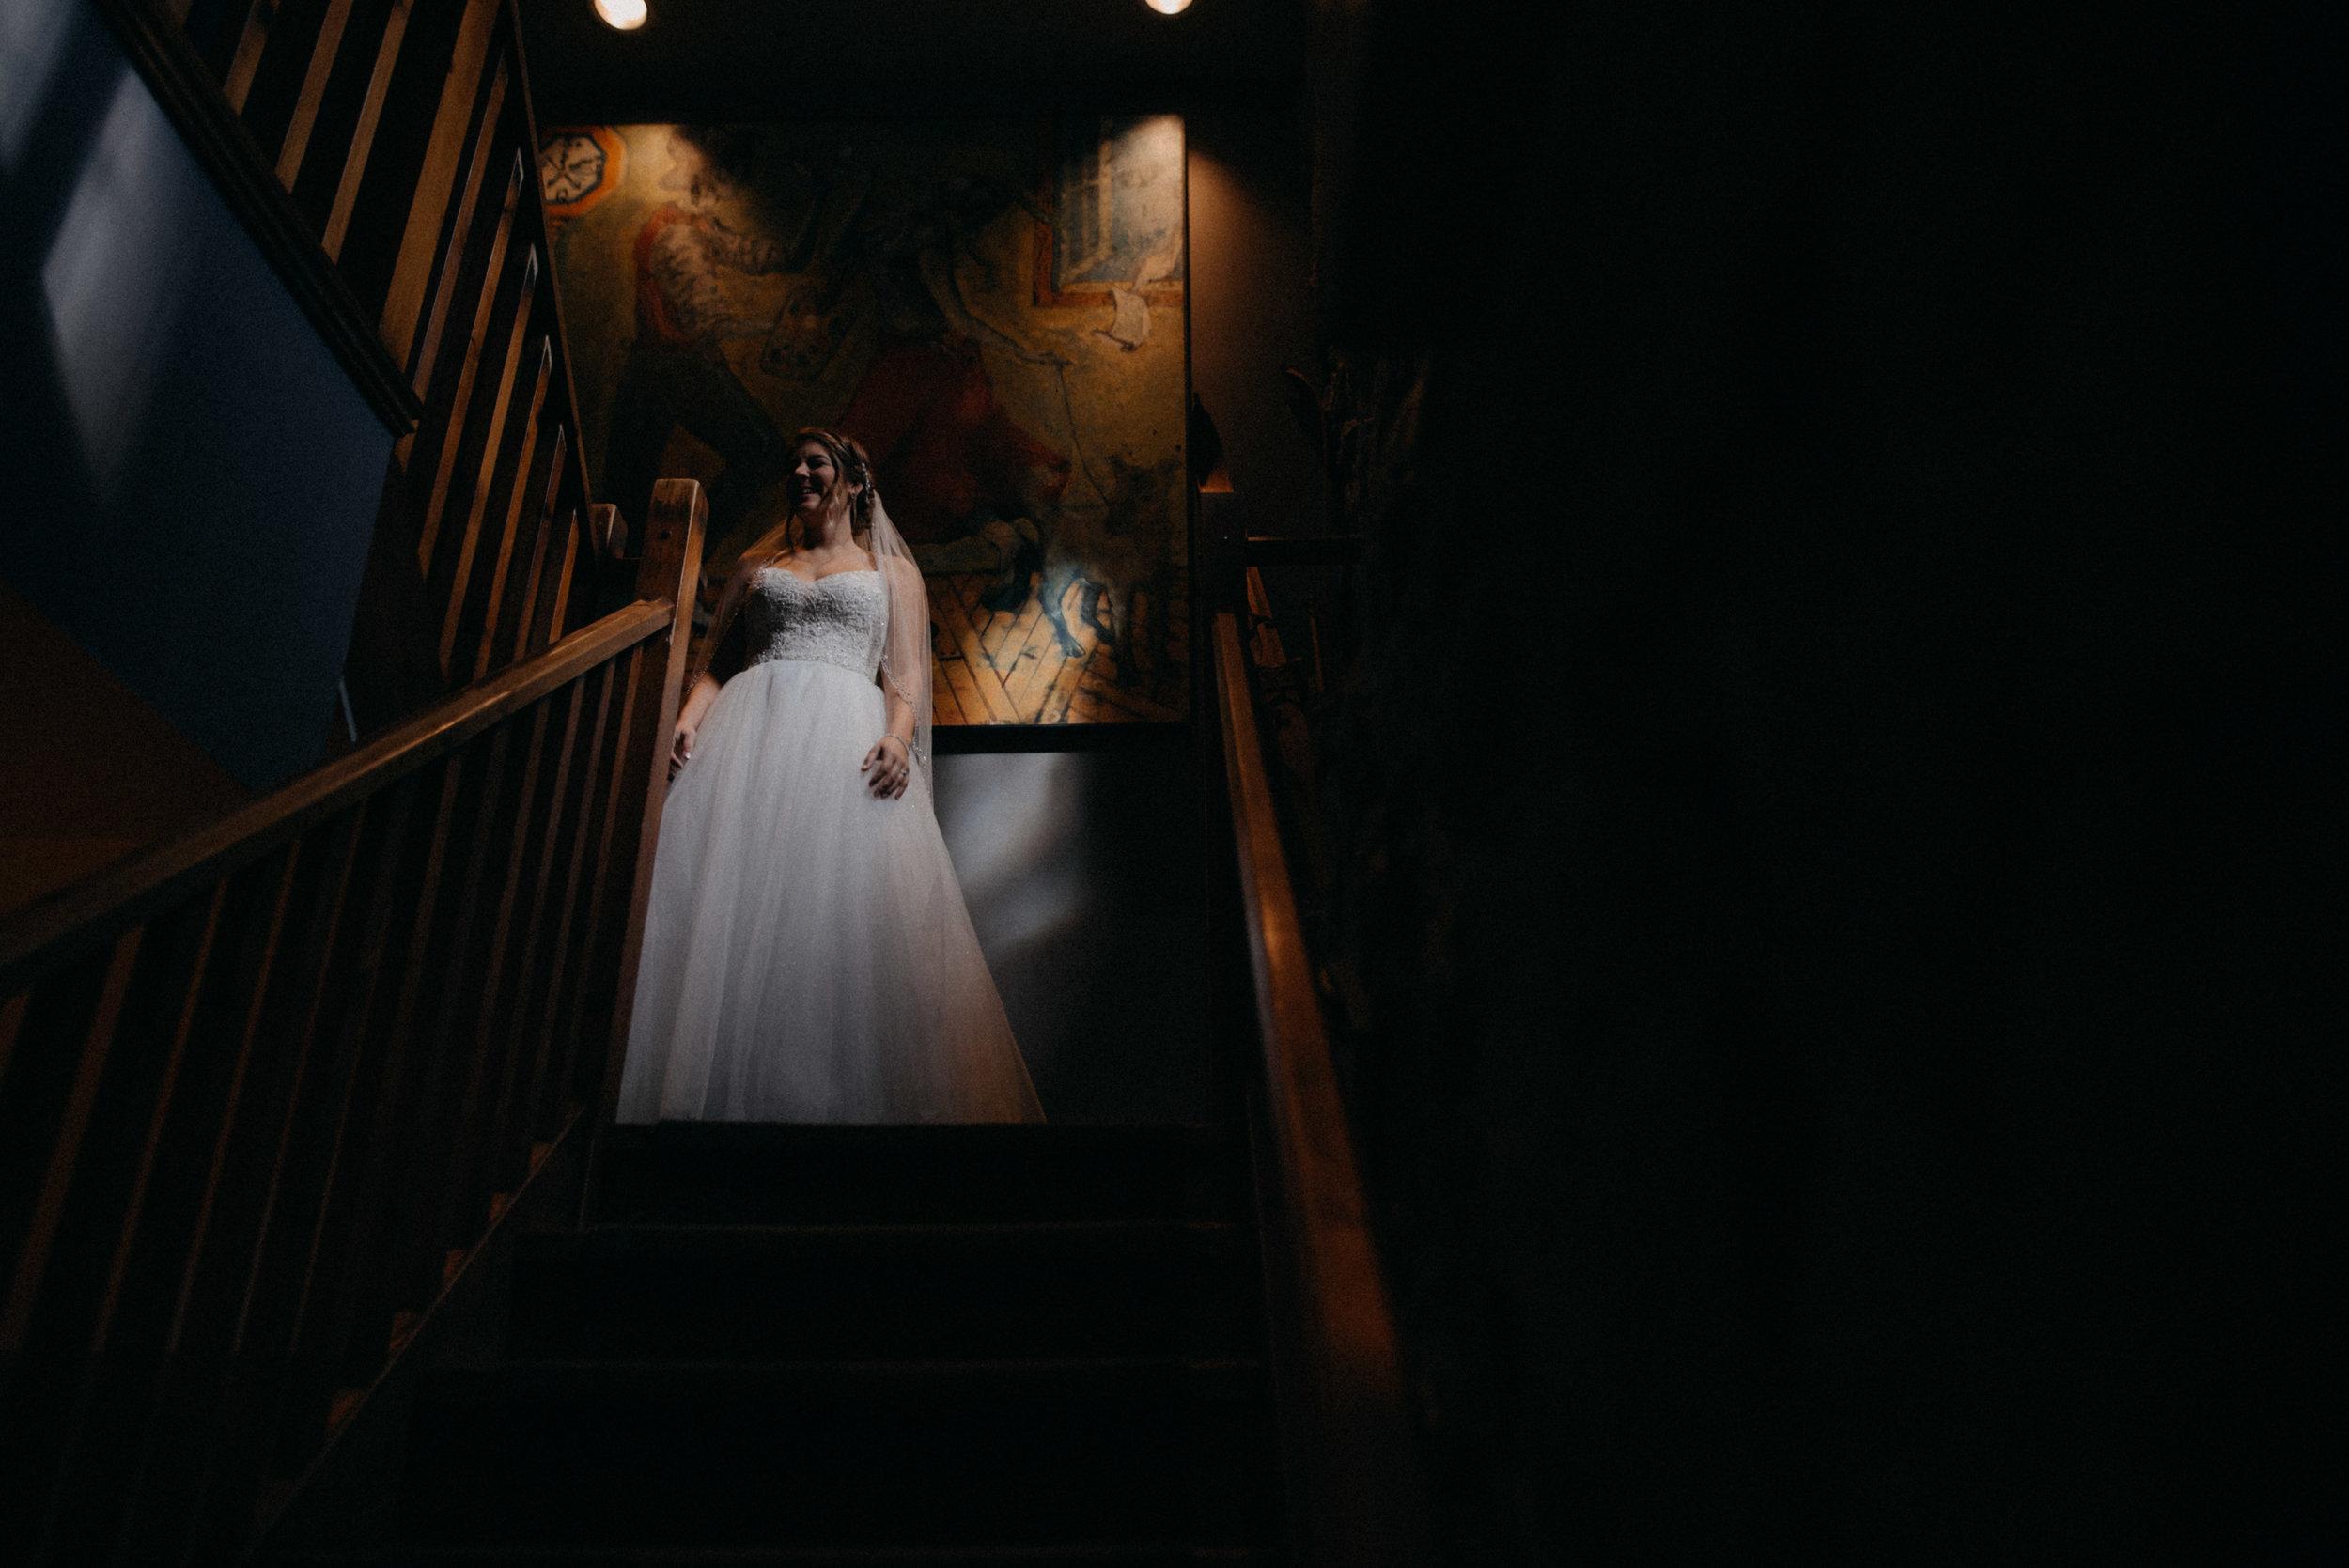 photographe_gatineau_mariage_ottawa_photographer_wedding_natasha_liard_photo_documentary_candid_lifestyle_wakefield_mill_red_bridge (48).jpg